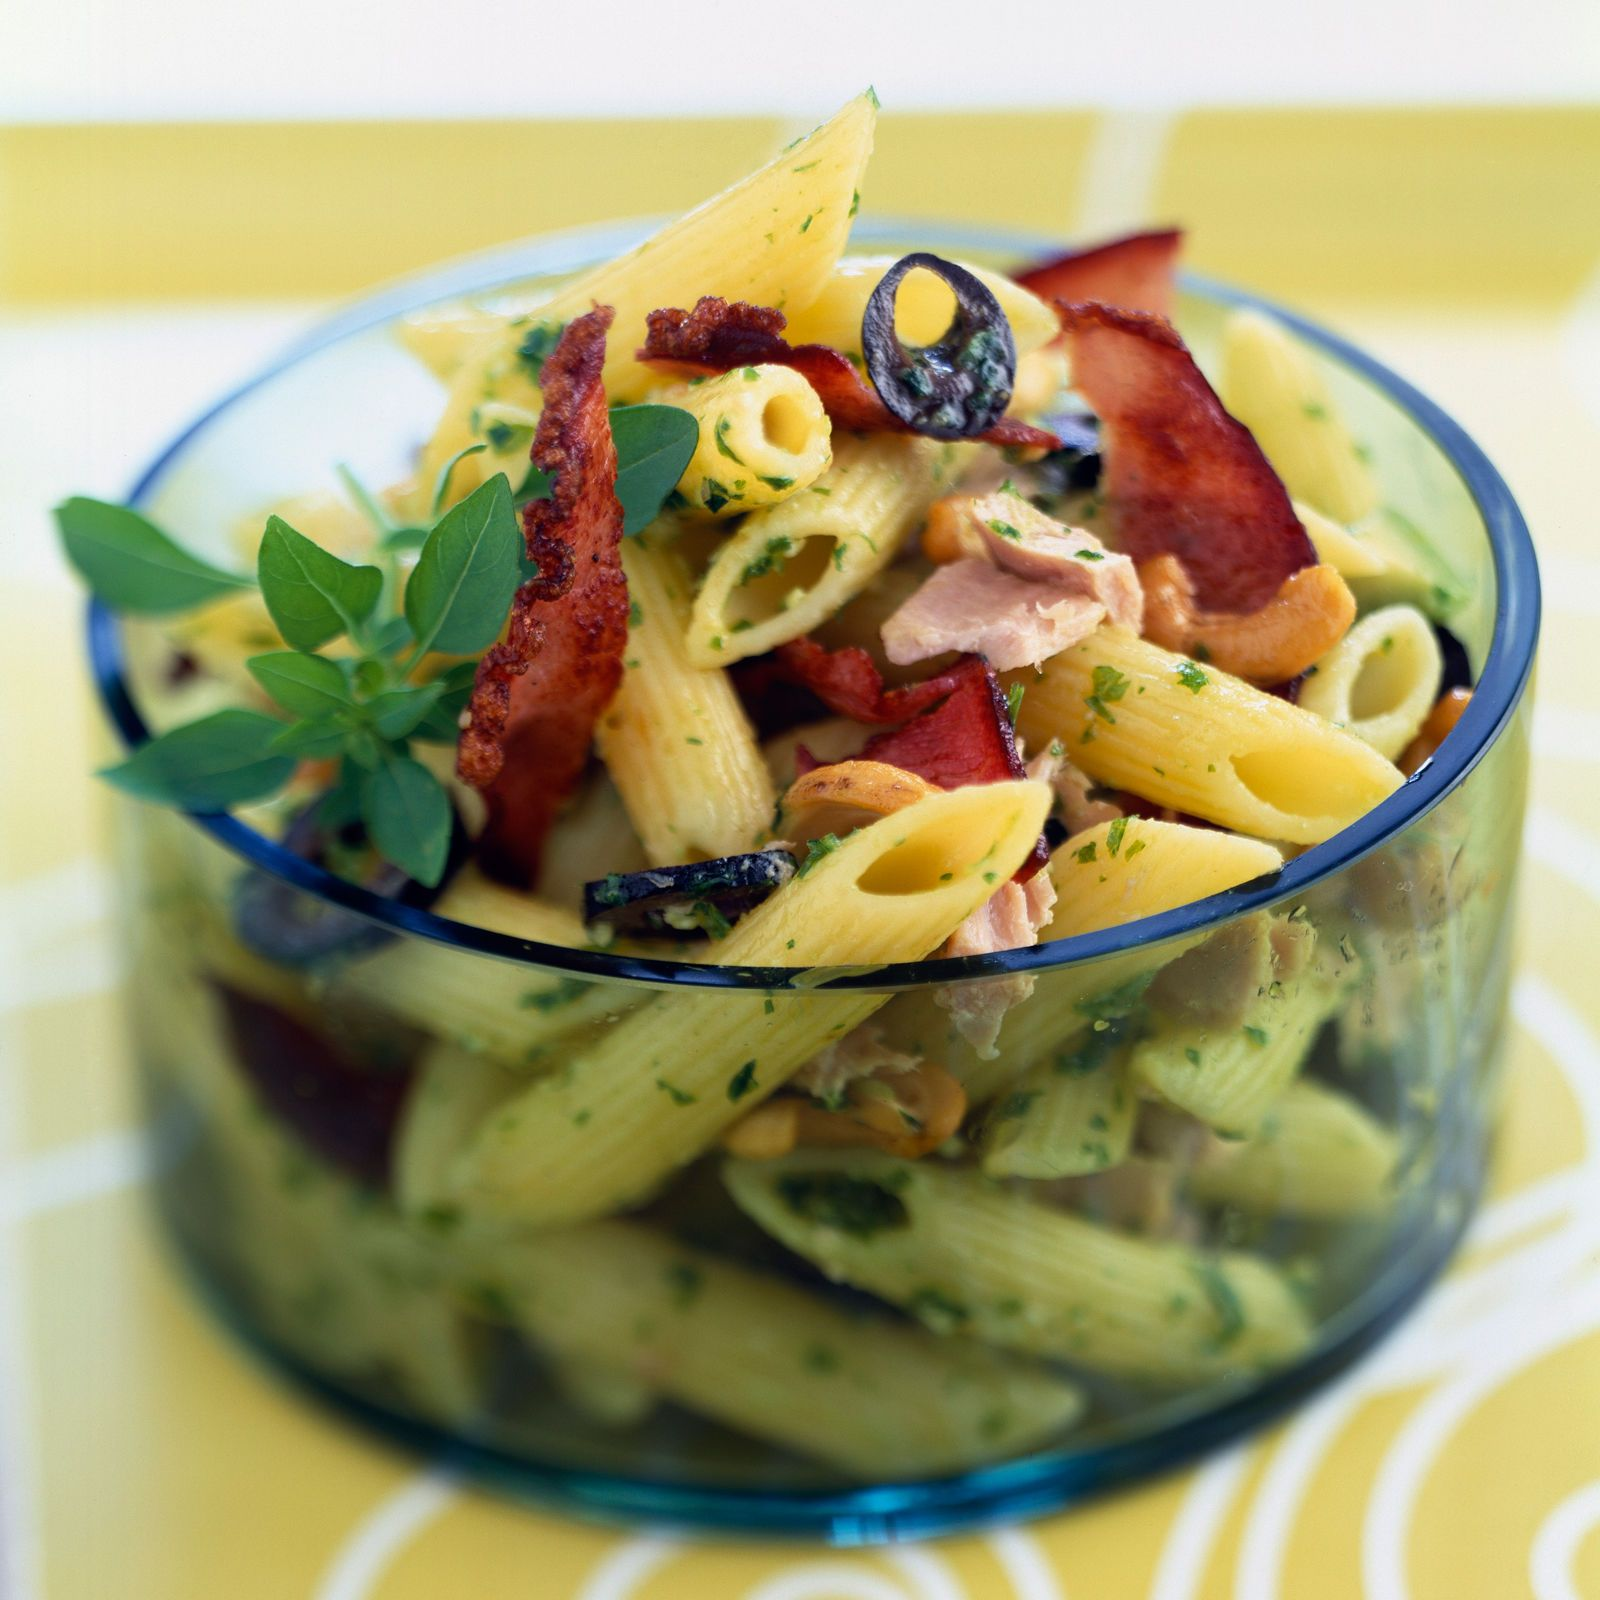 Salade de pâtes au pesto | Recette | Recette salade de pate, Pesto ... - Salade Pates Pesto